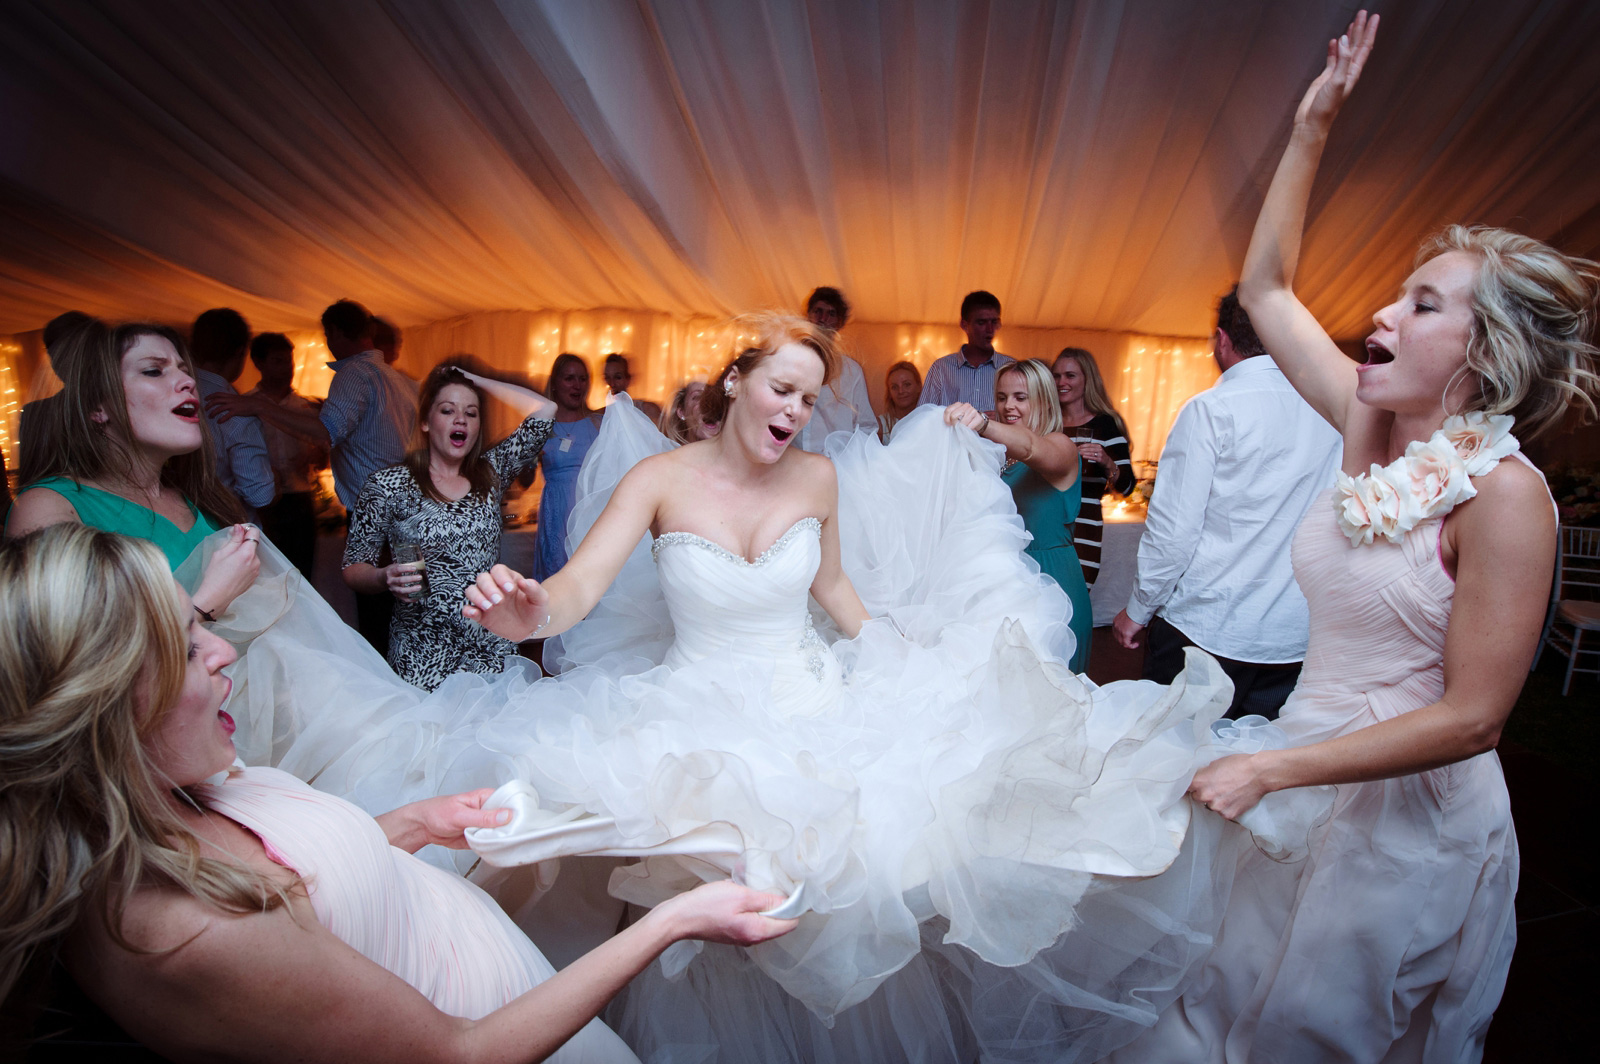 Dancing-Jacki-Bruniquel-Hoorah002